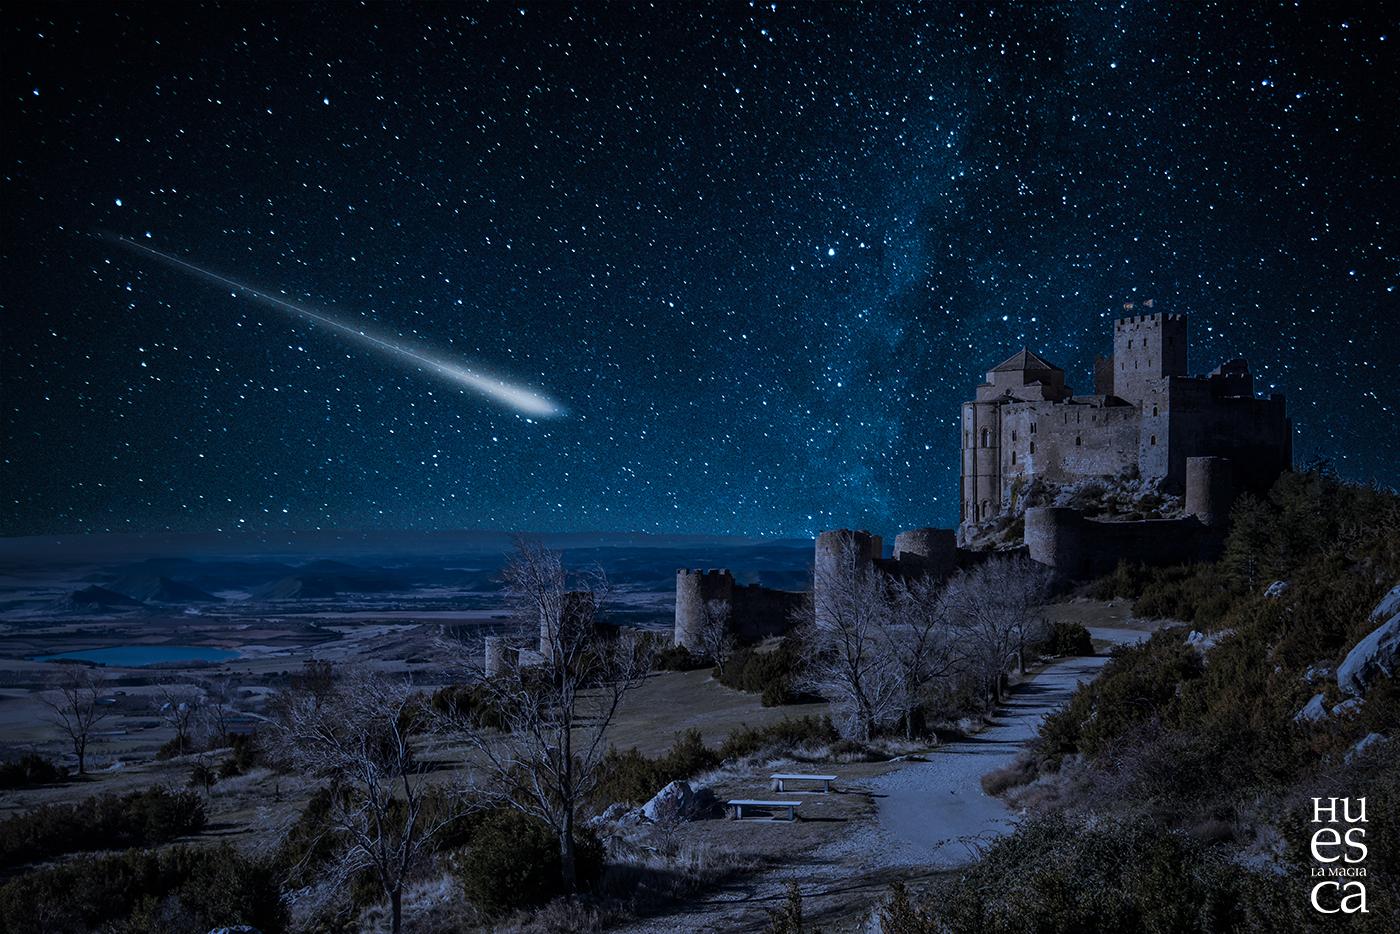 La magia de Huesca en el Sistema Solar 🌜🪐